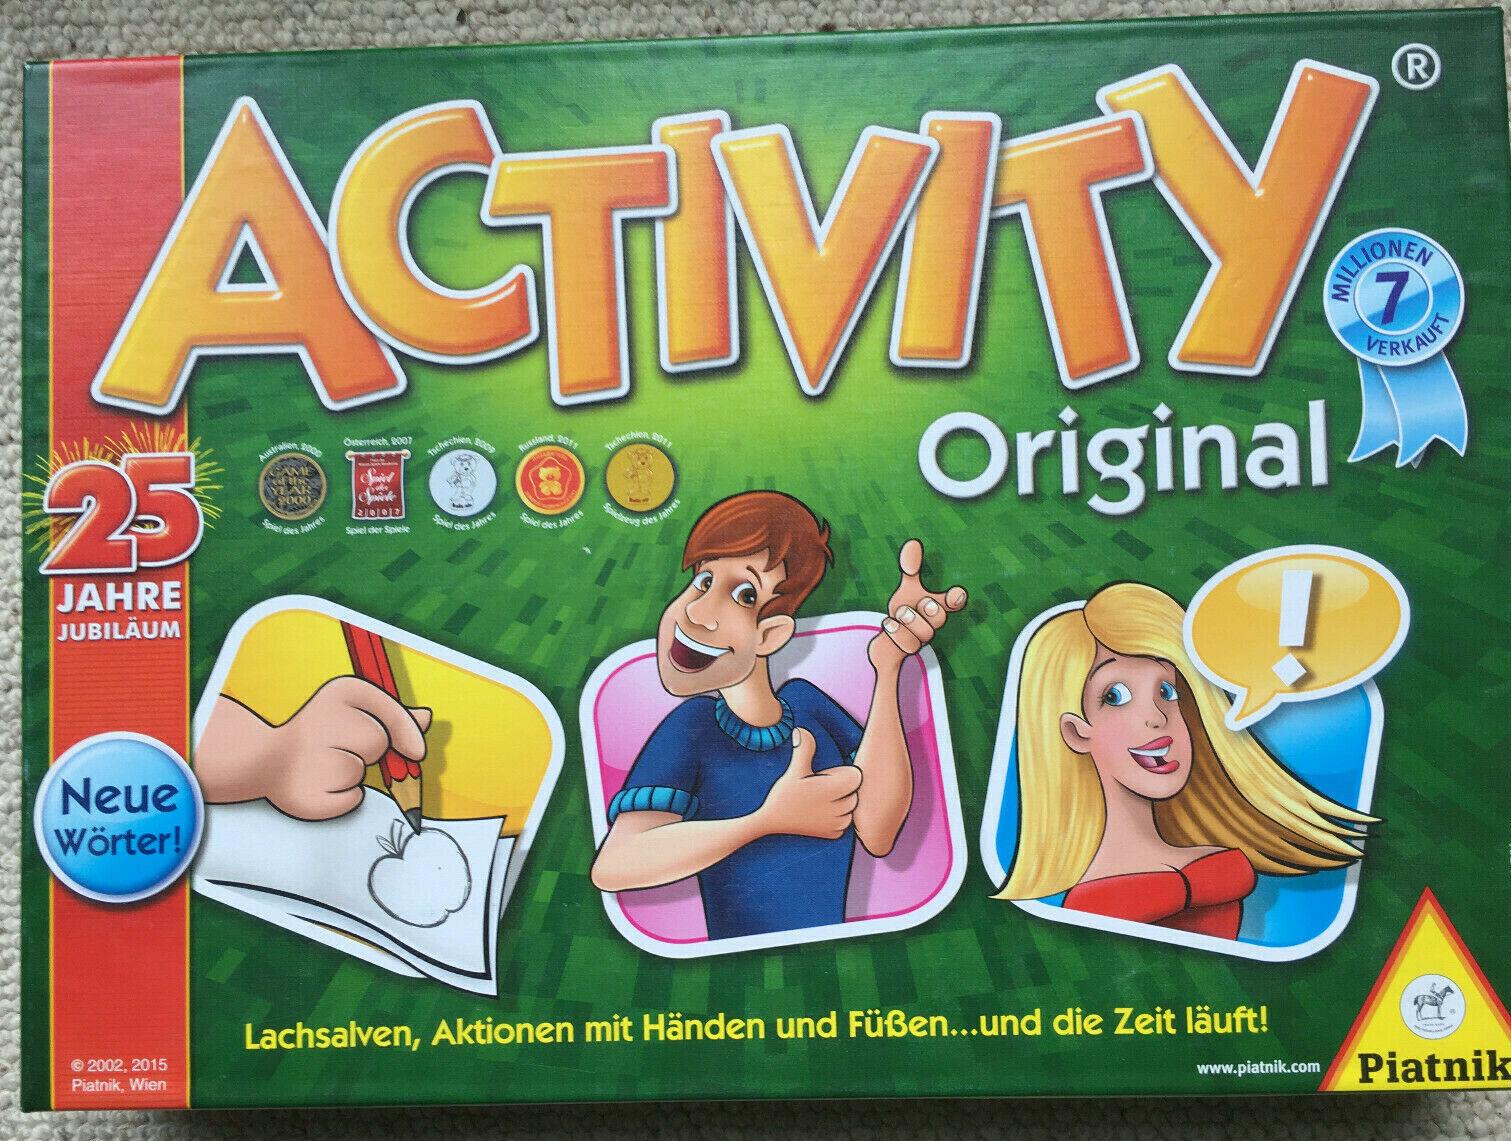 Klassiker Activity Original Piatnik Jubiläumsausgabe , neue Wörter, 3-16 Spieler